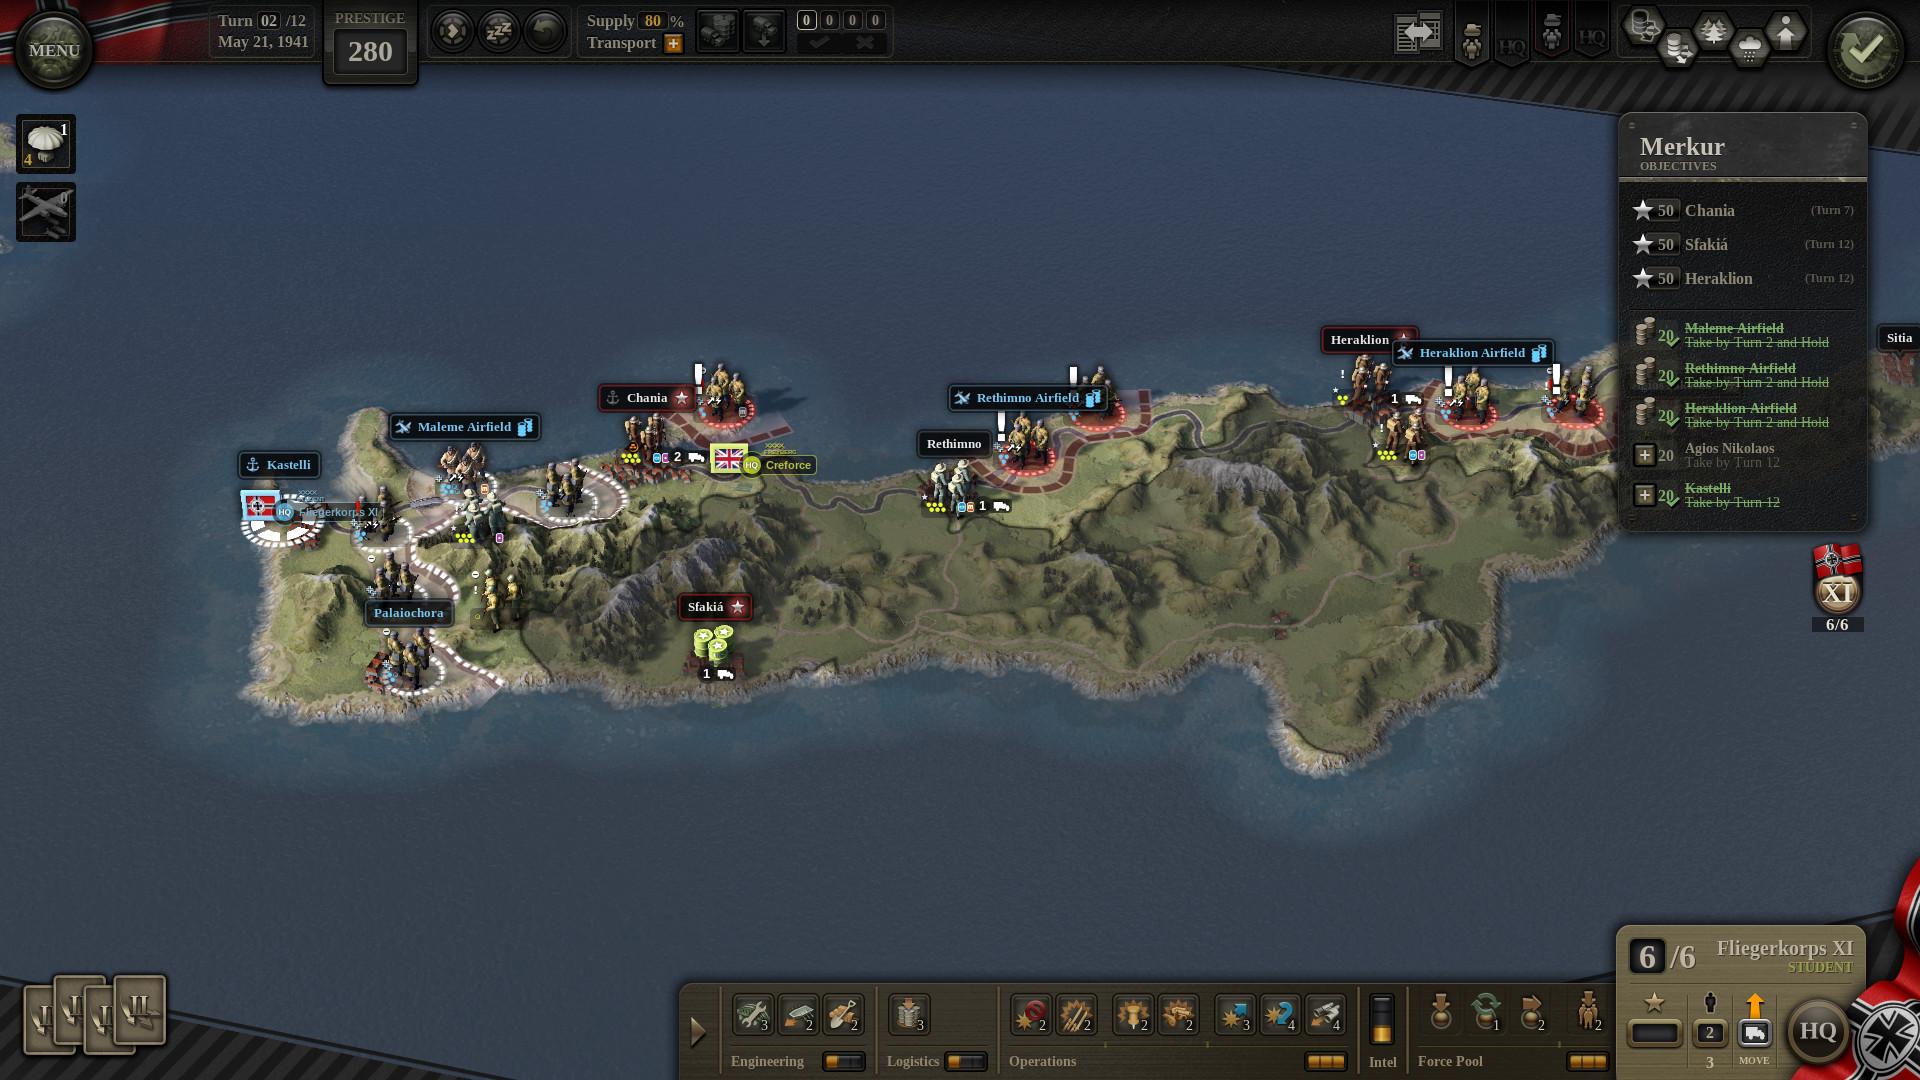 Unity of Command II - Blitzkrieg